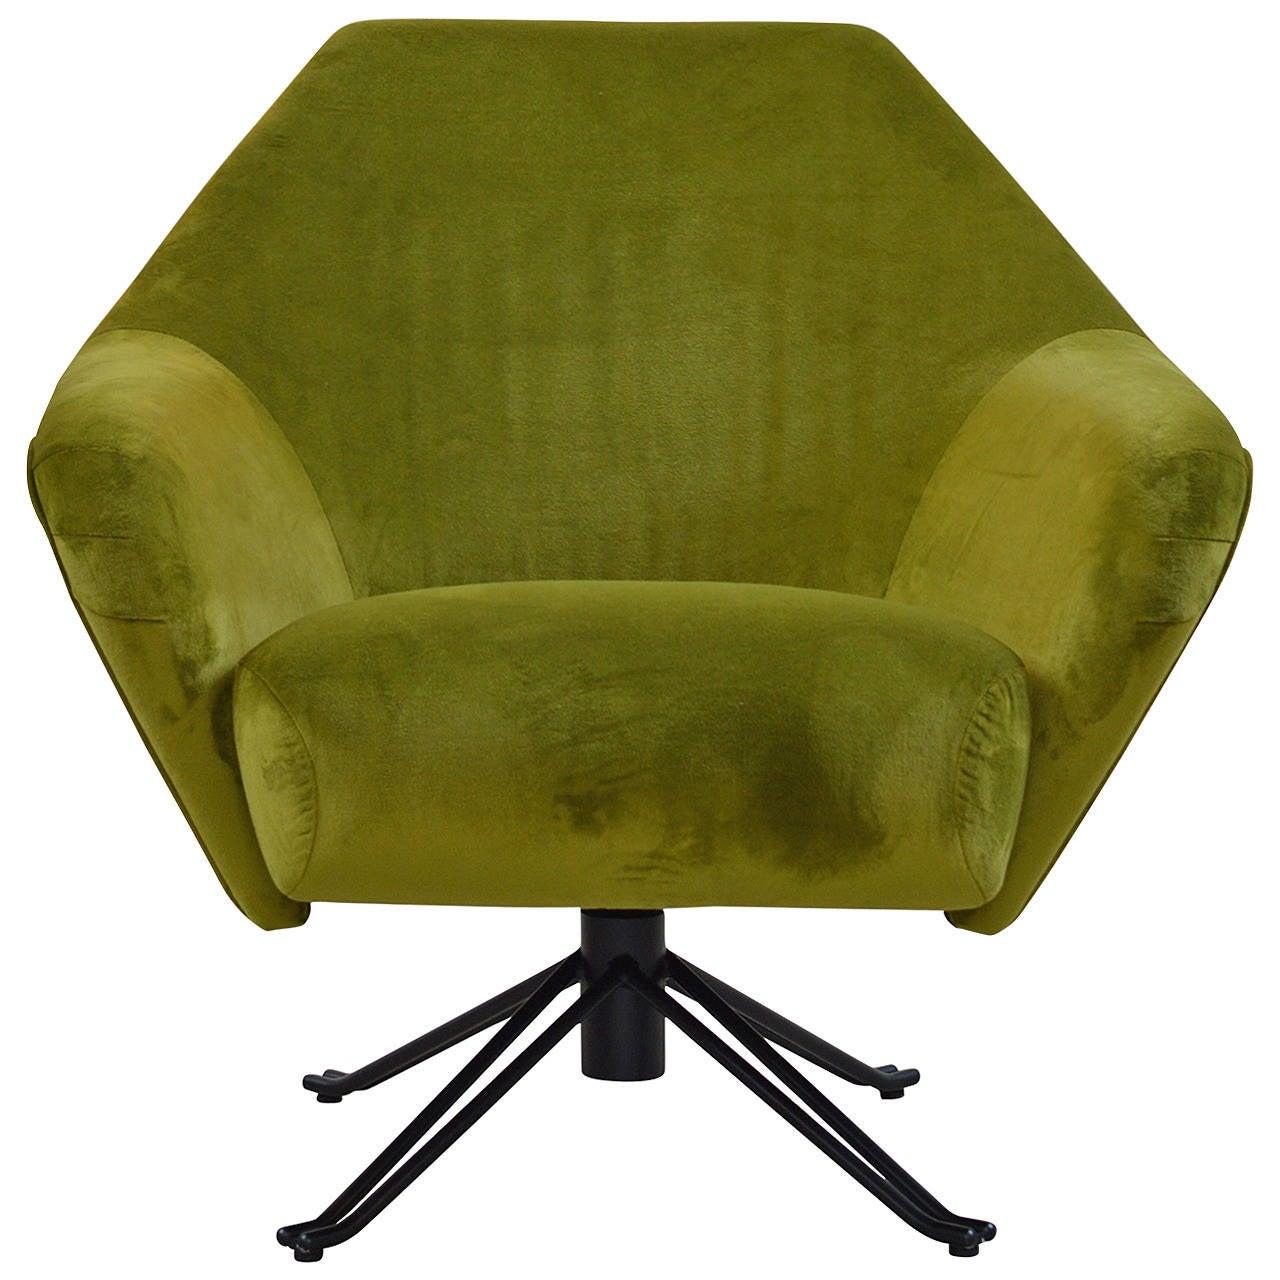 Chartreuse P32 Armchair by Osvaldo Borsani for Tecno